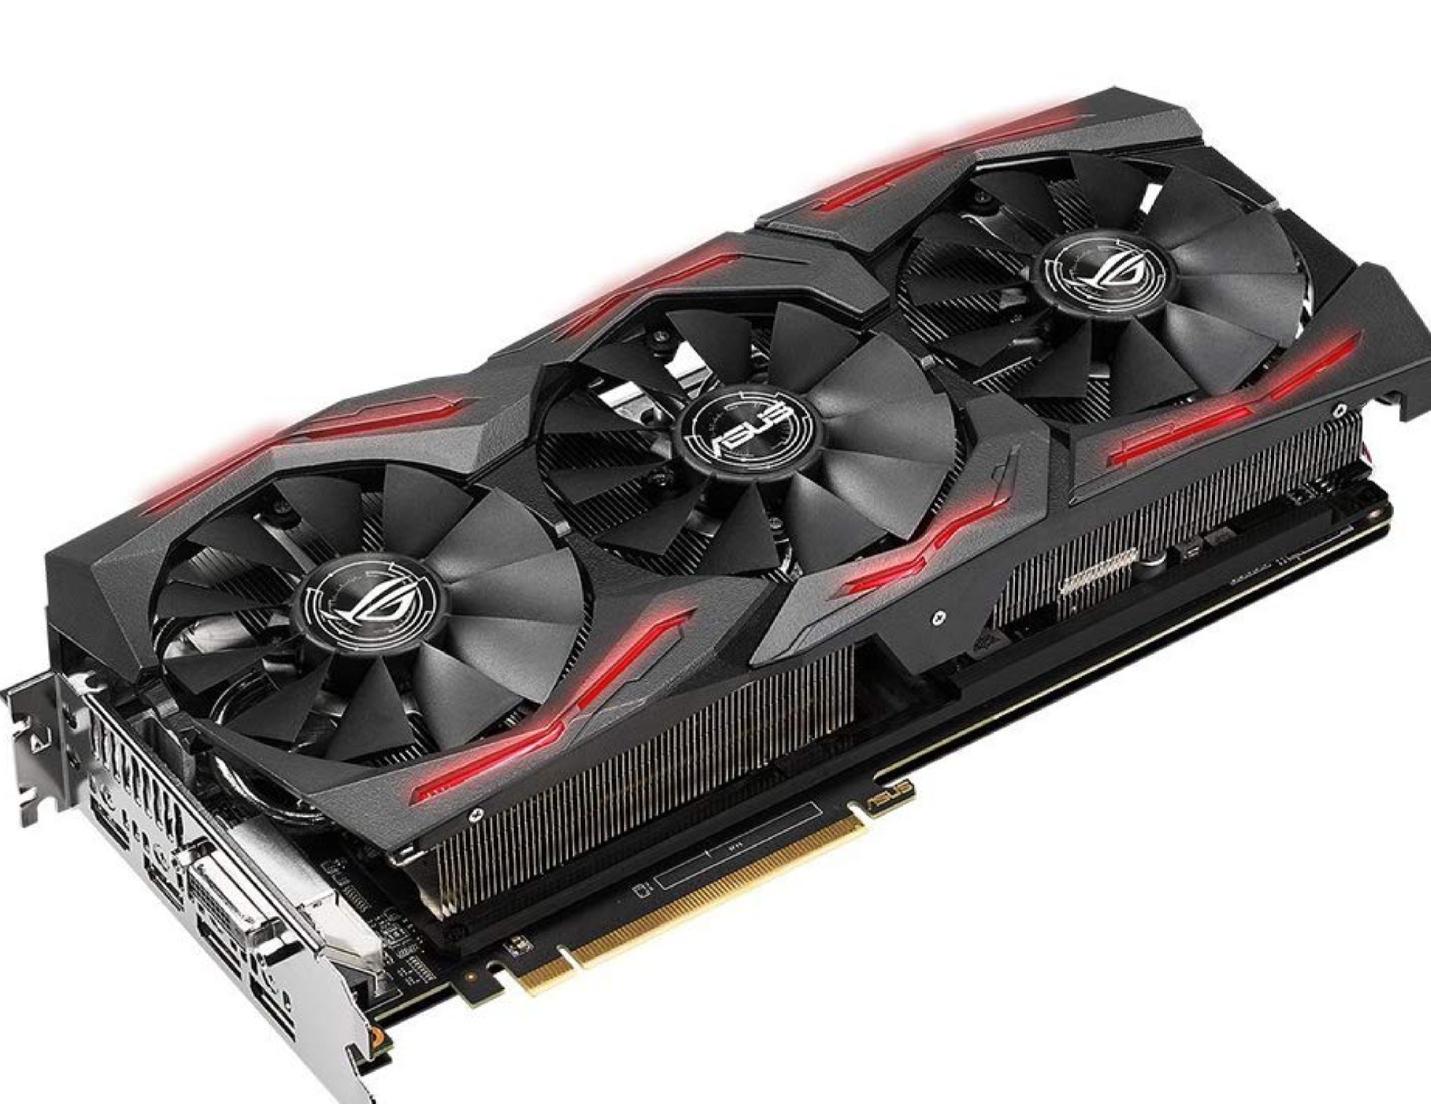 Asus Radeon RX VEGA 64 Strix OC 8GB, LUB Zotac Gaming GeForce RTX 2060 Amp Edition6GB -1418zł. Amazon.de